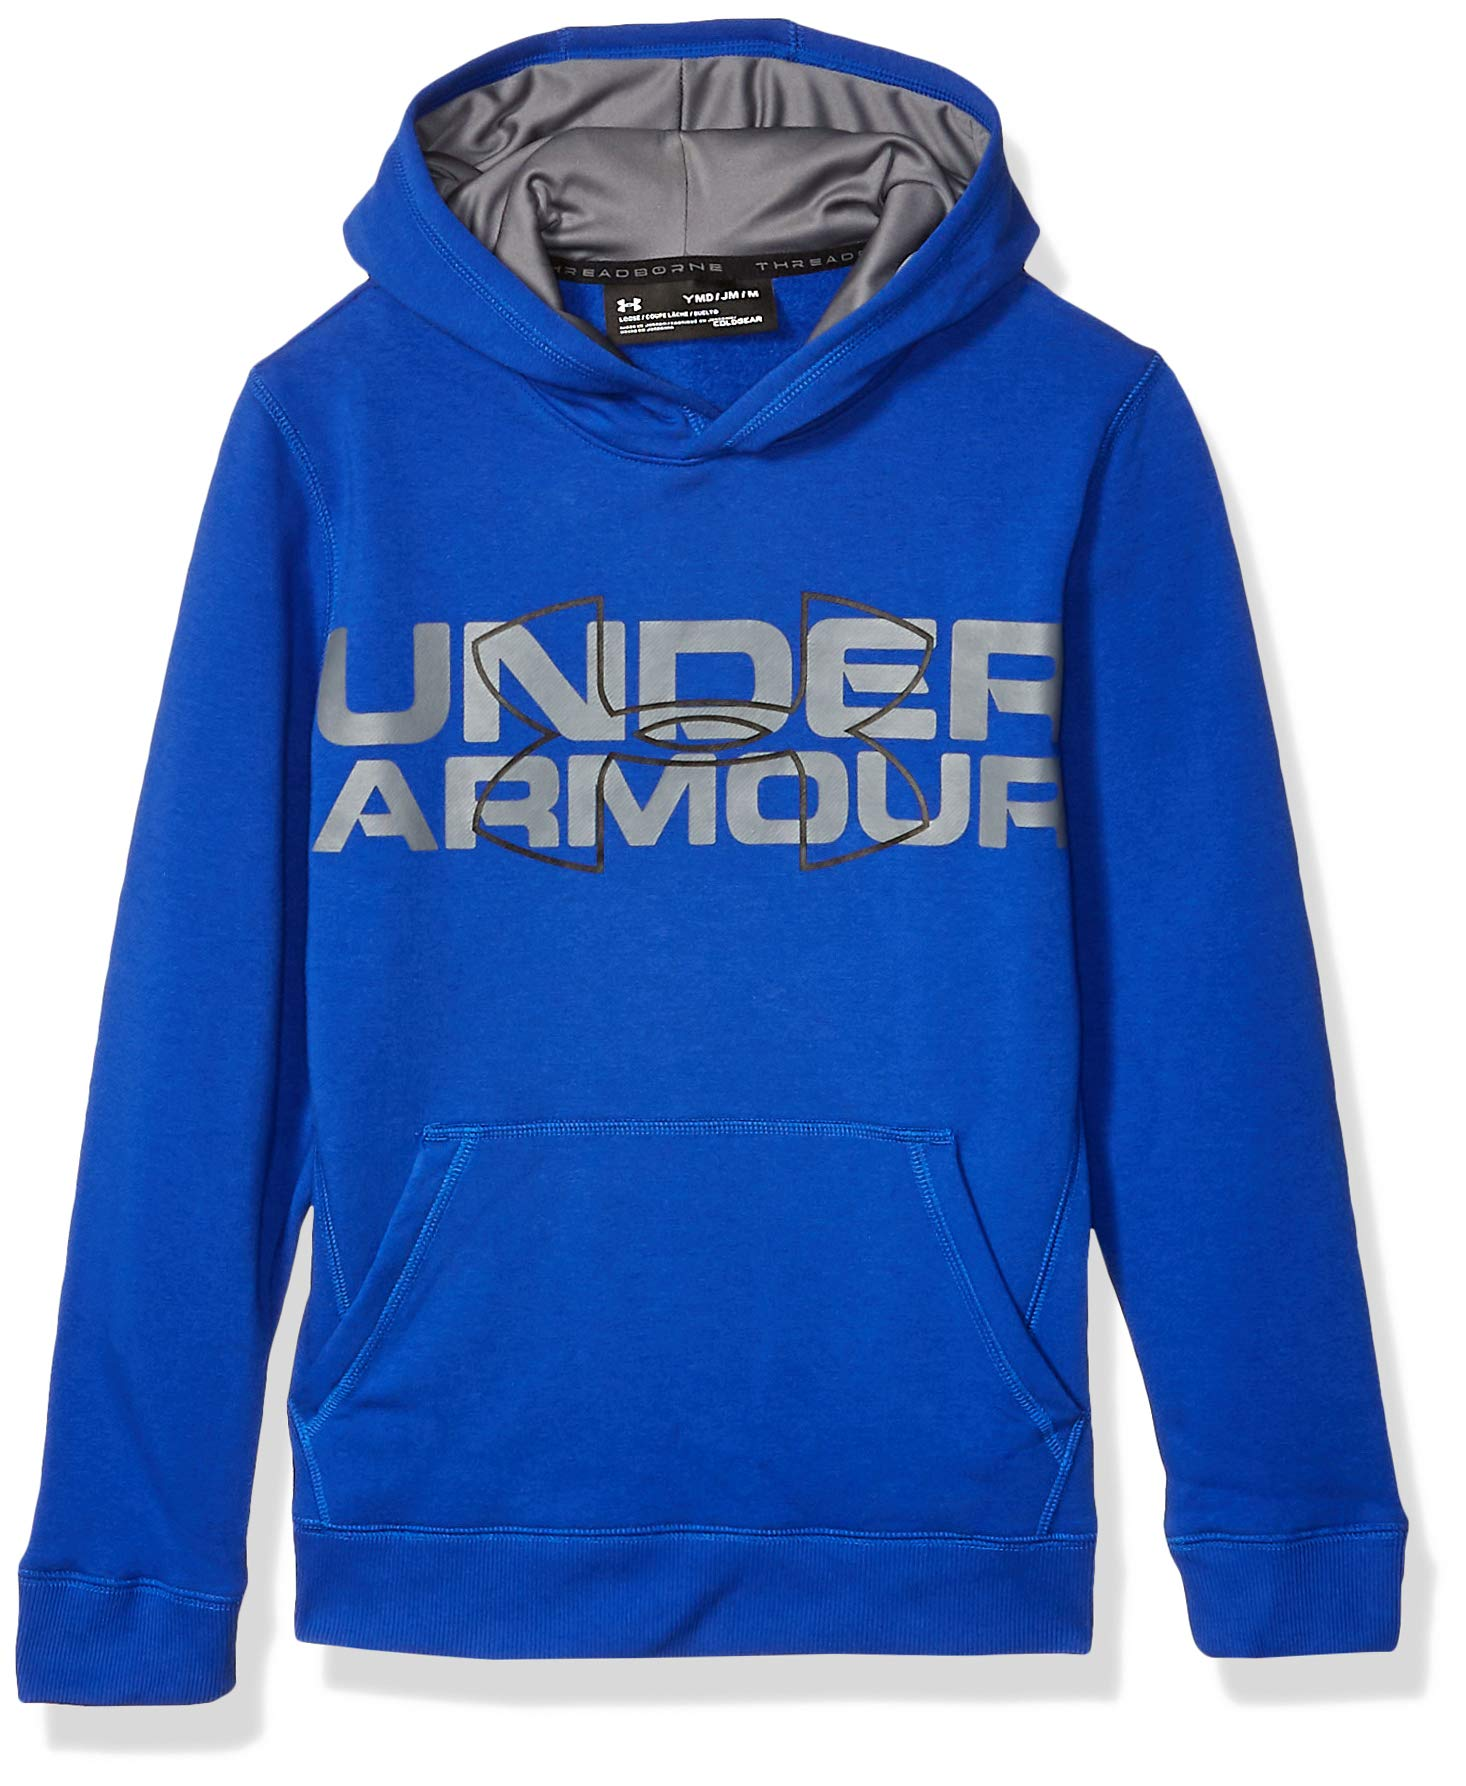 Under Armour Boys Threadborne Logo Hoodie, Ultra Blue /Black, Youth Small by Under Armour